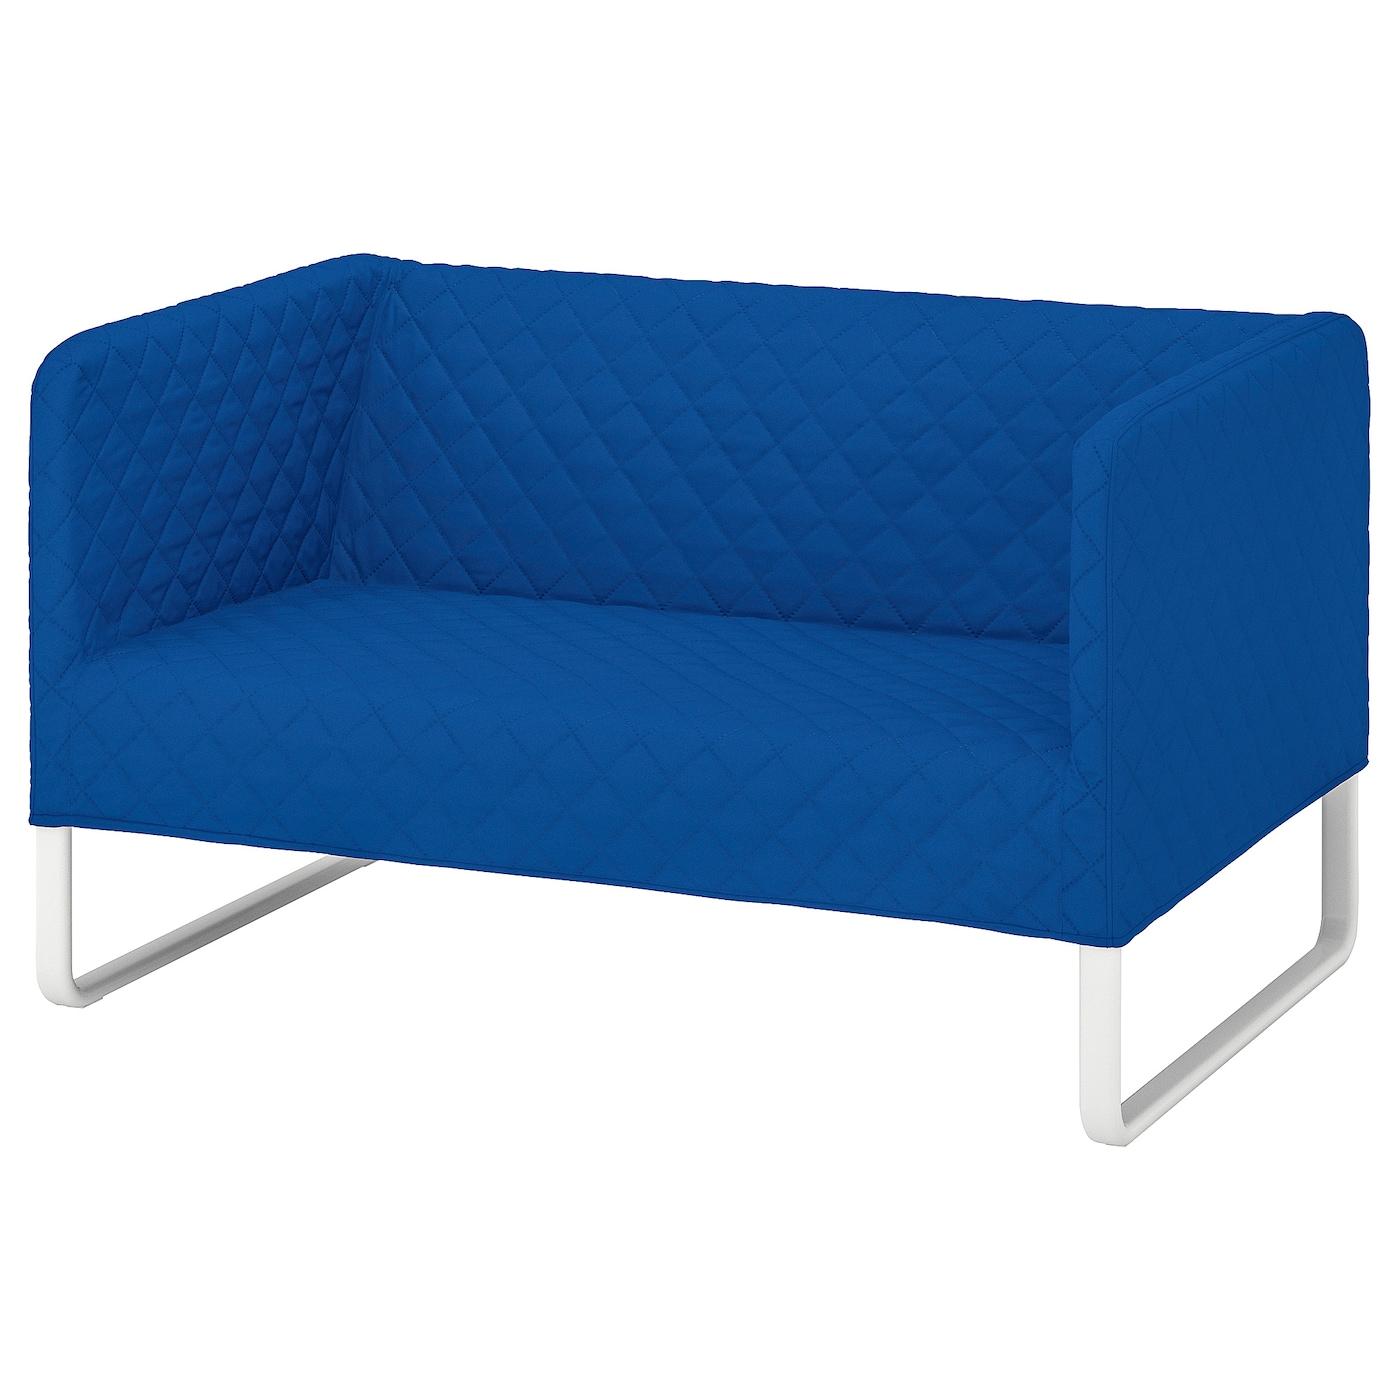 Knopparp 2 Seat Sofa Knisa Bright